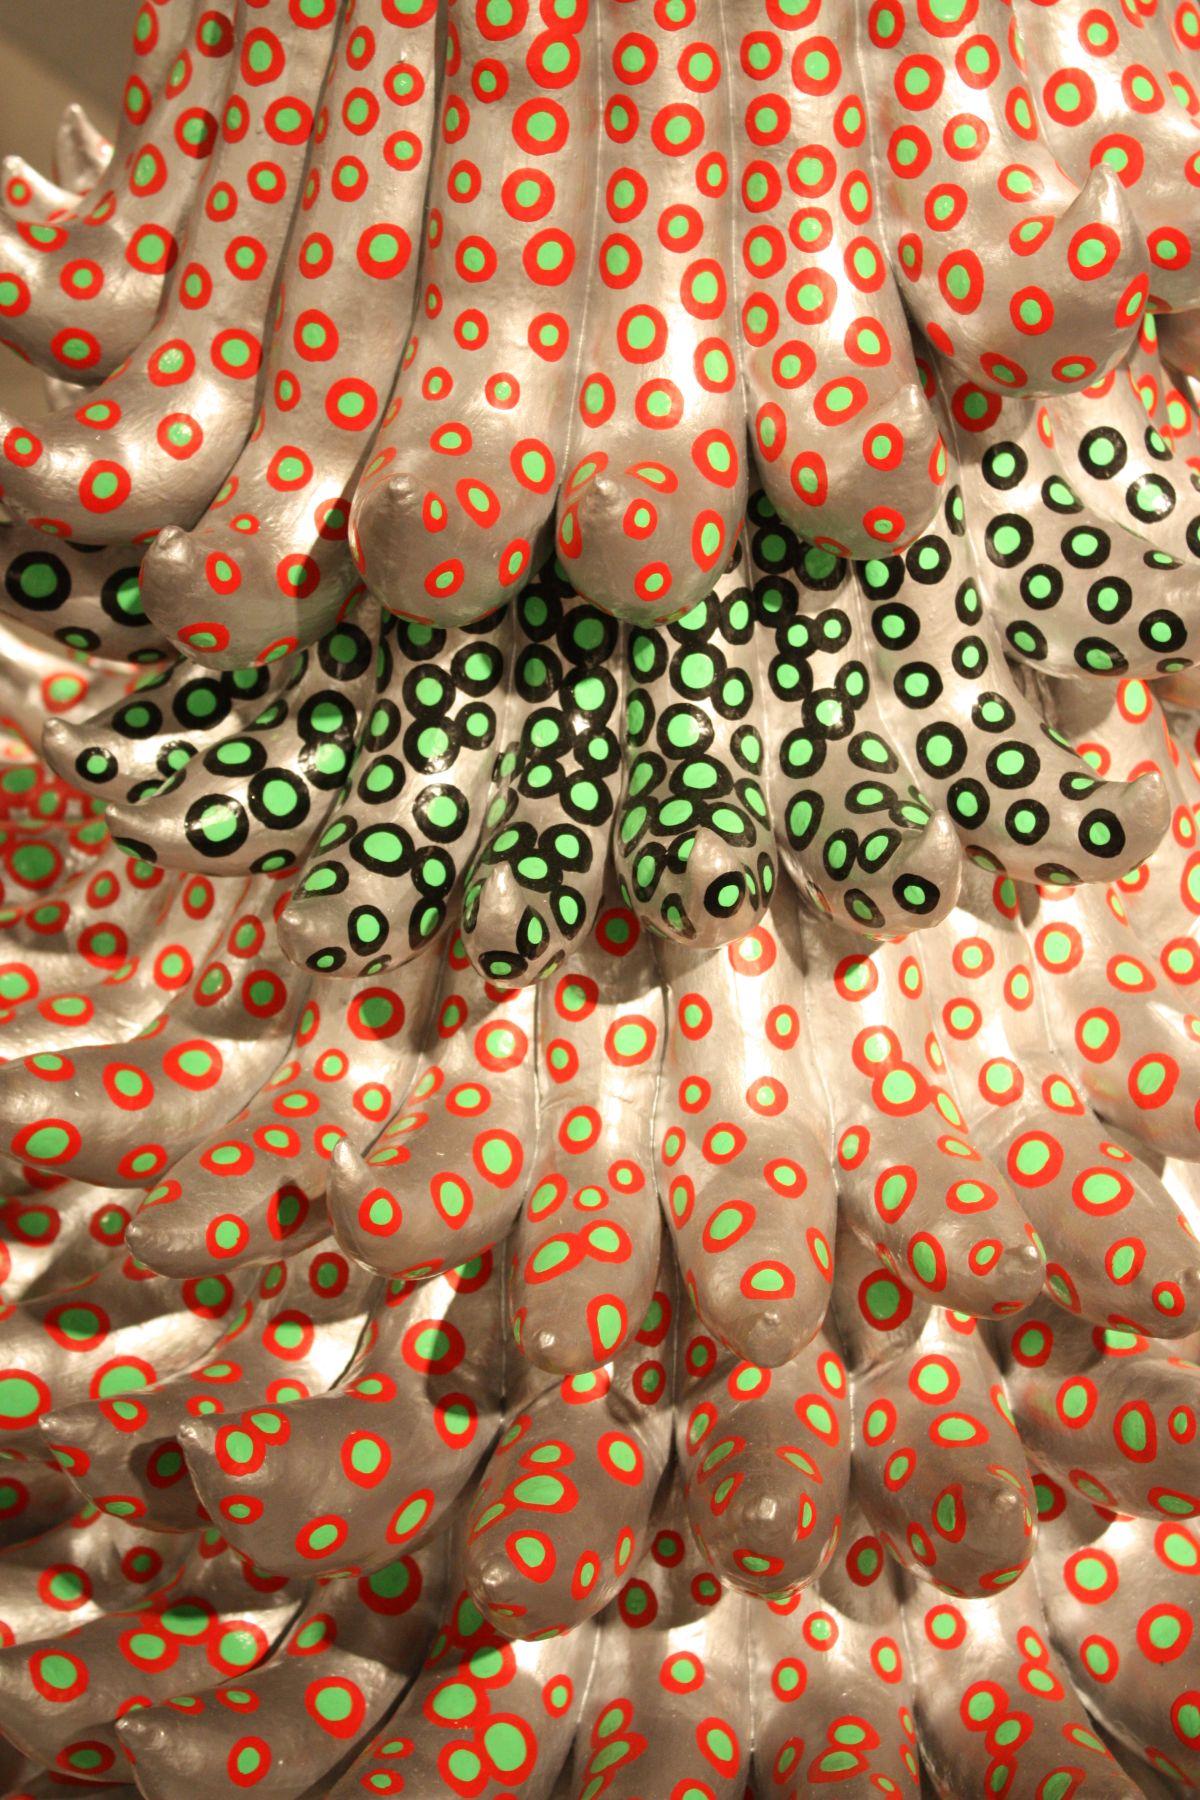 Victoria Miro tree detail